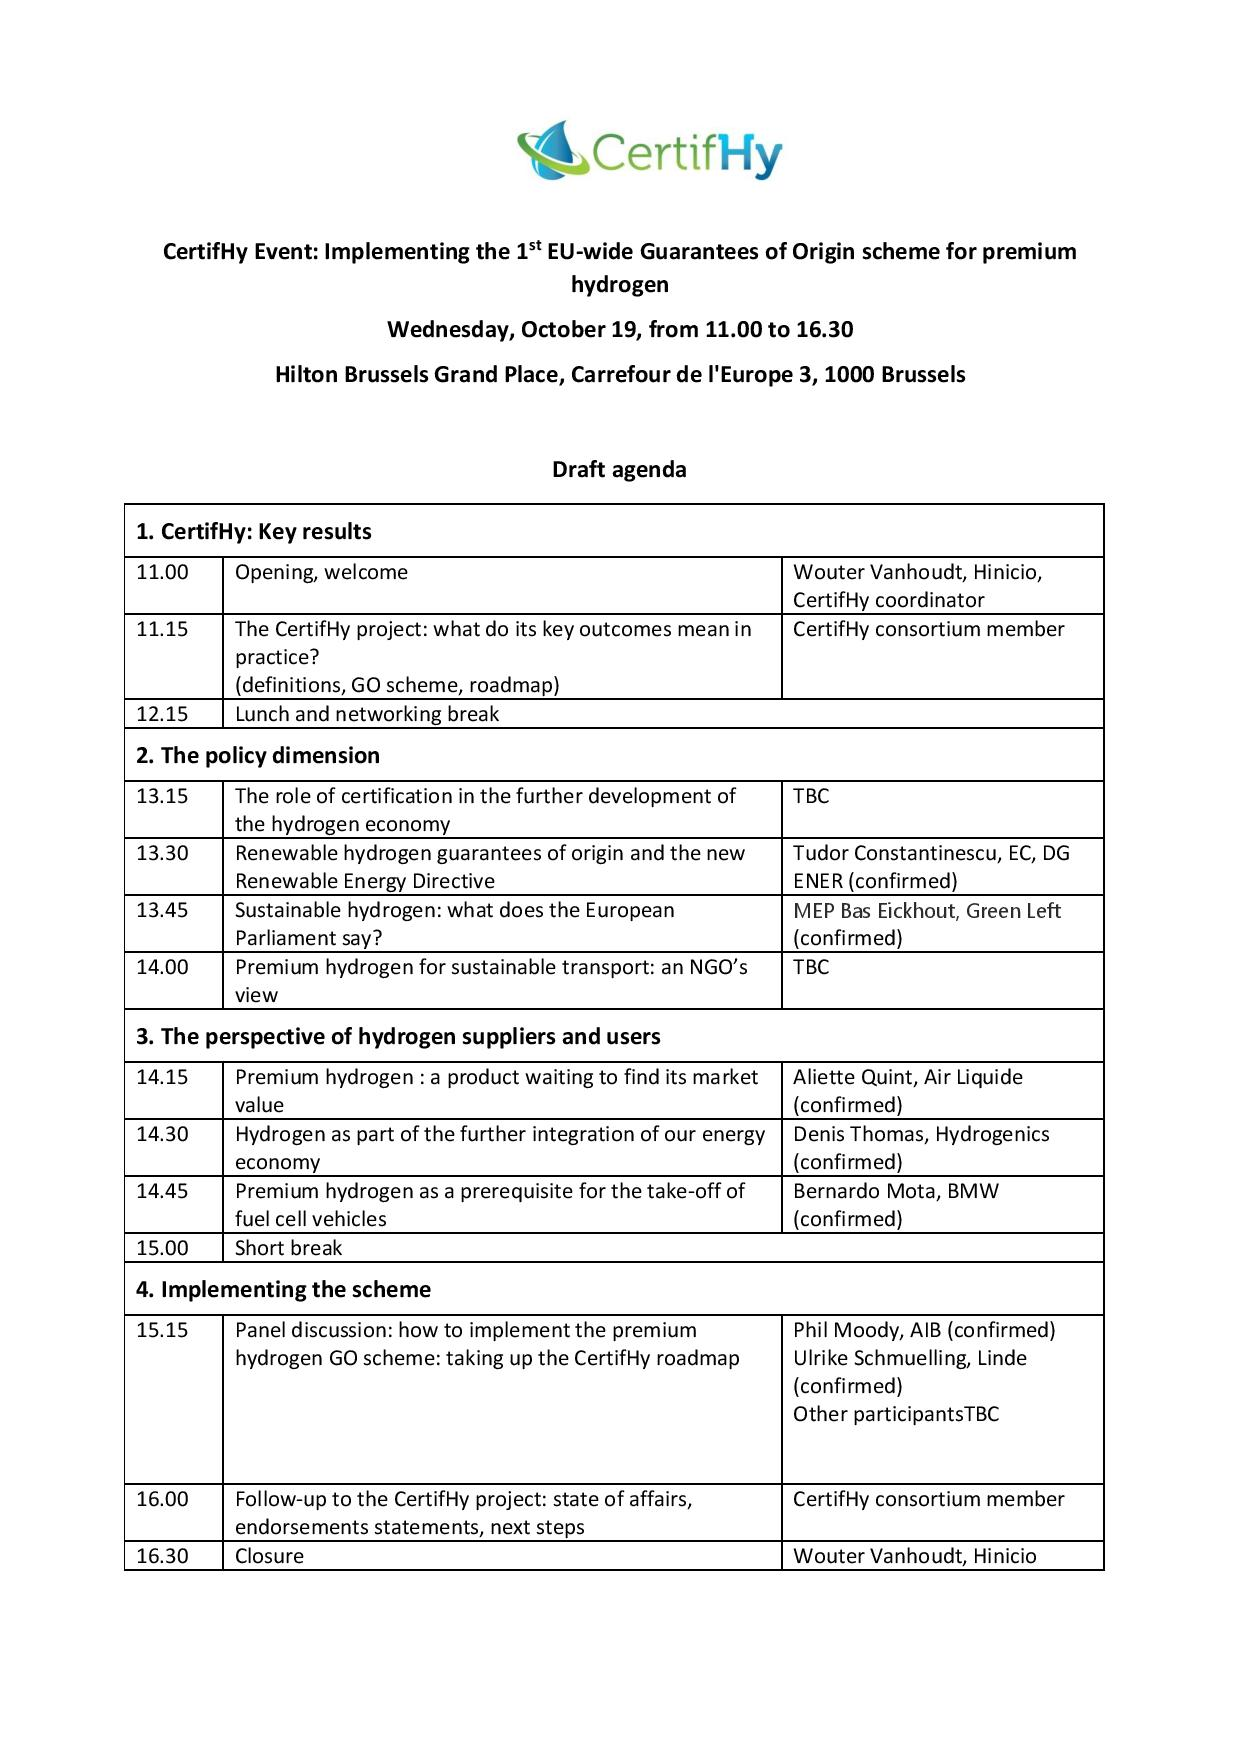 Draft Agenda_CertifHy Event